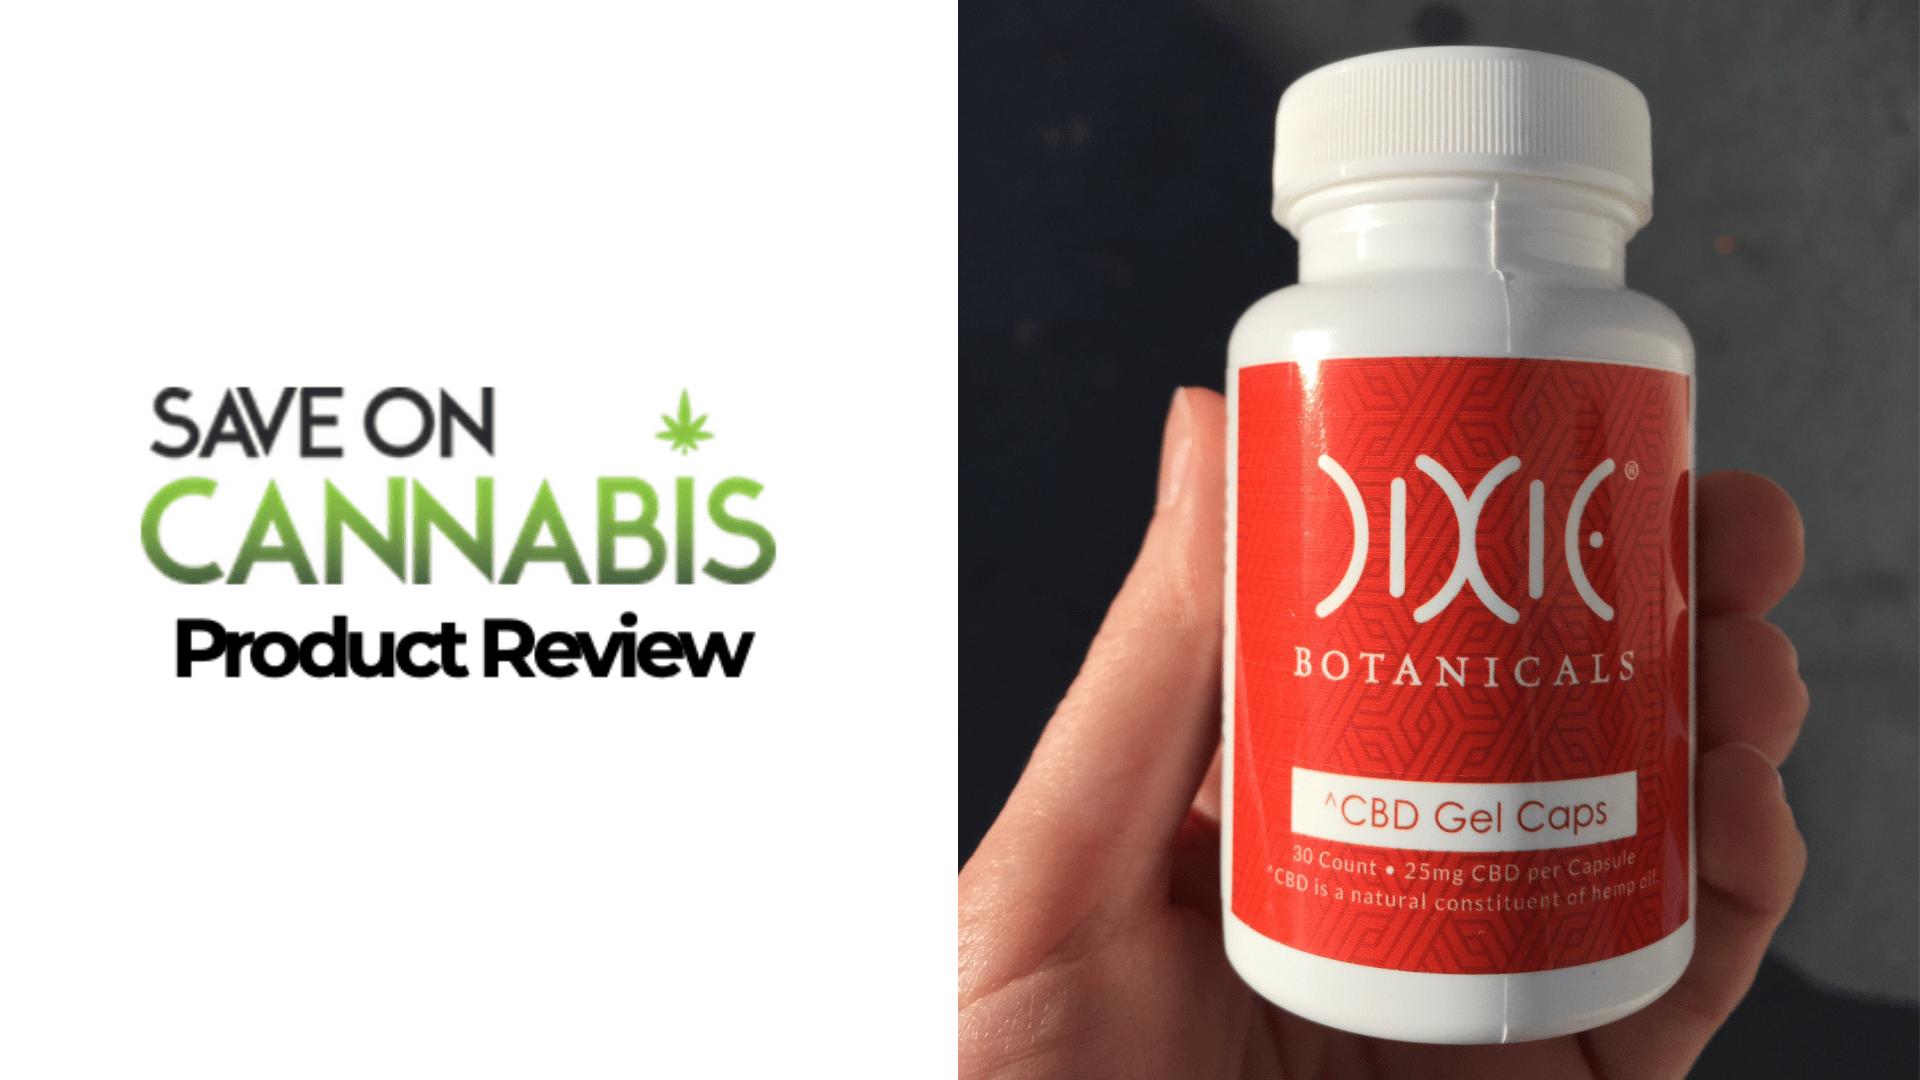 dixie botanicals cbd gel caps review save on cannabis Website